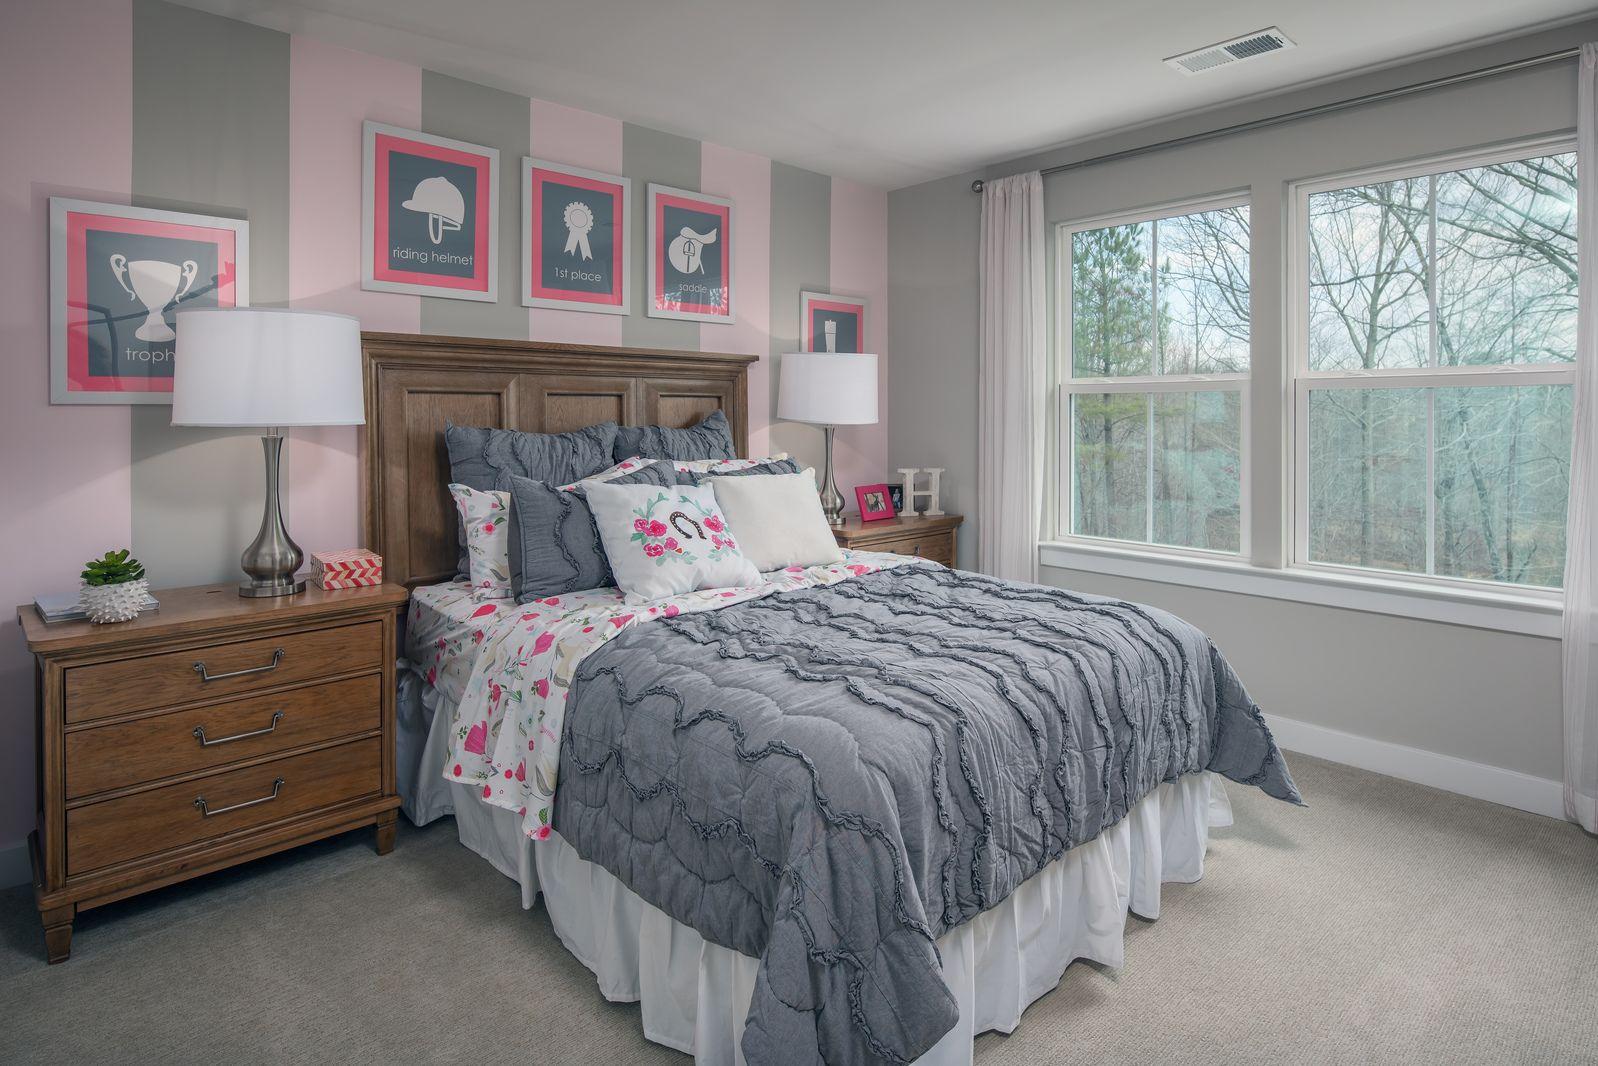 Bedroom featured in the Landon By HeartlandHomes in Morgantown, WV